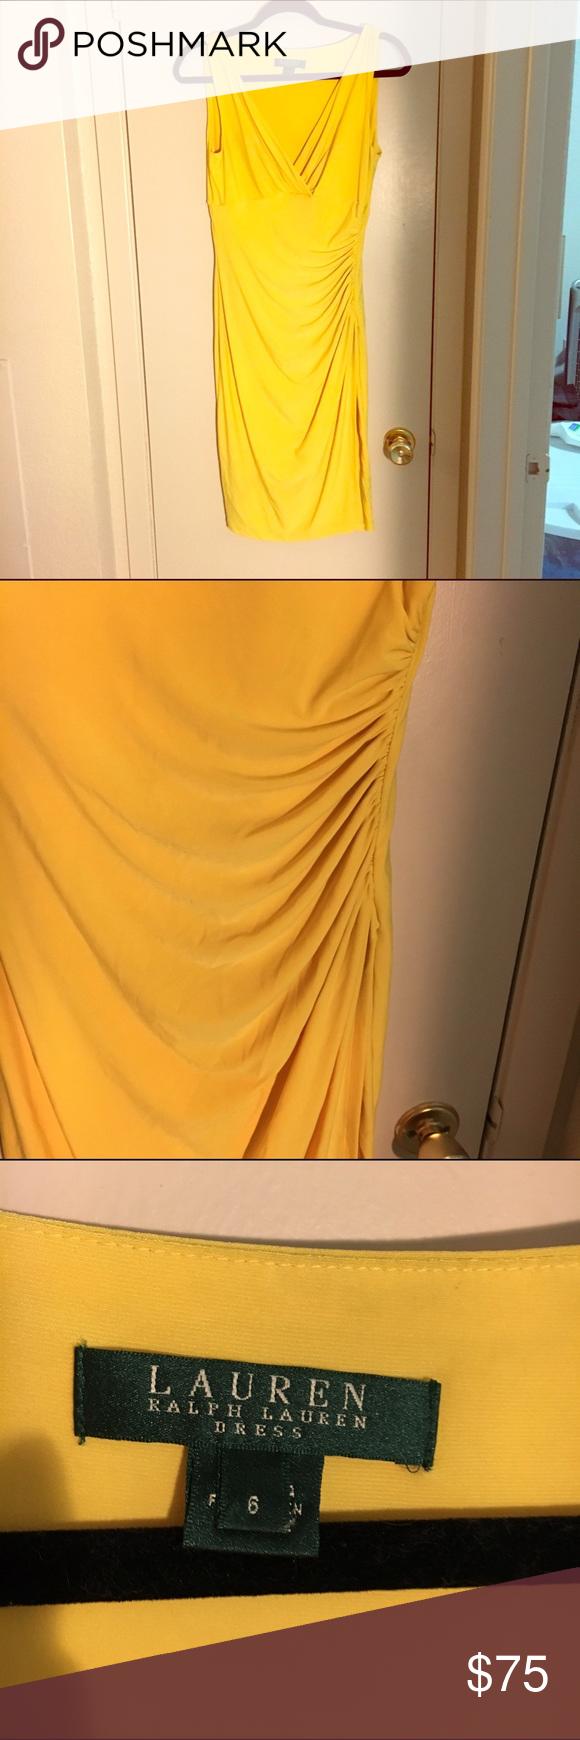 Lauren ralph lauren dress yellow cocktail dresses and customer support